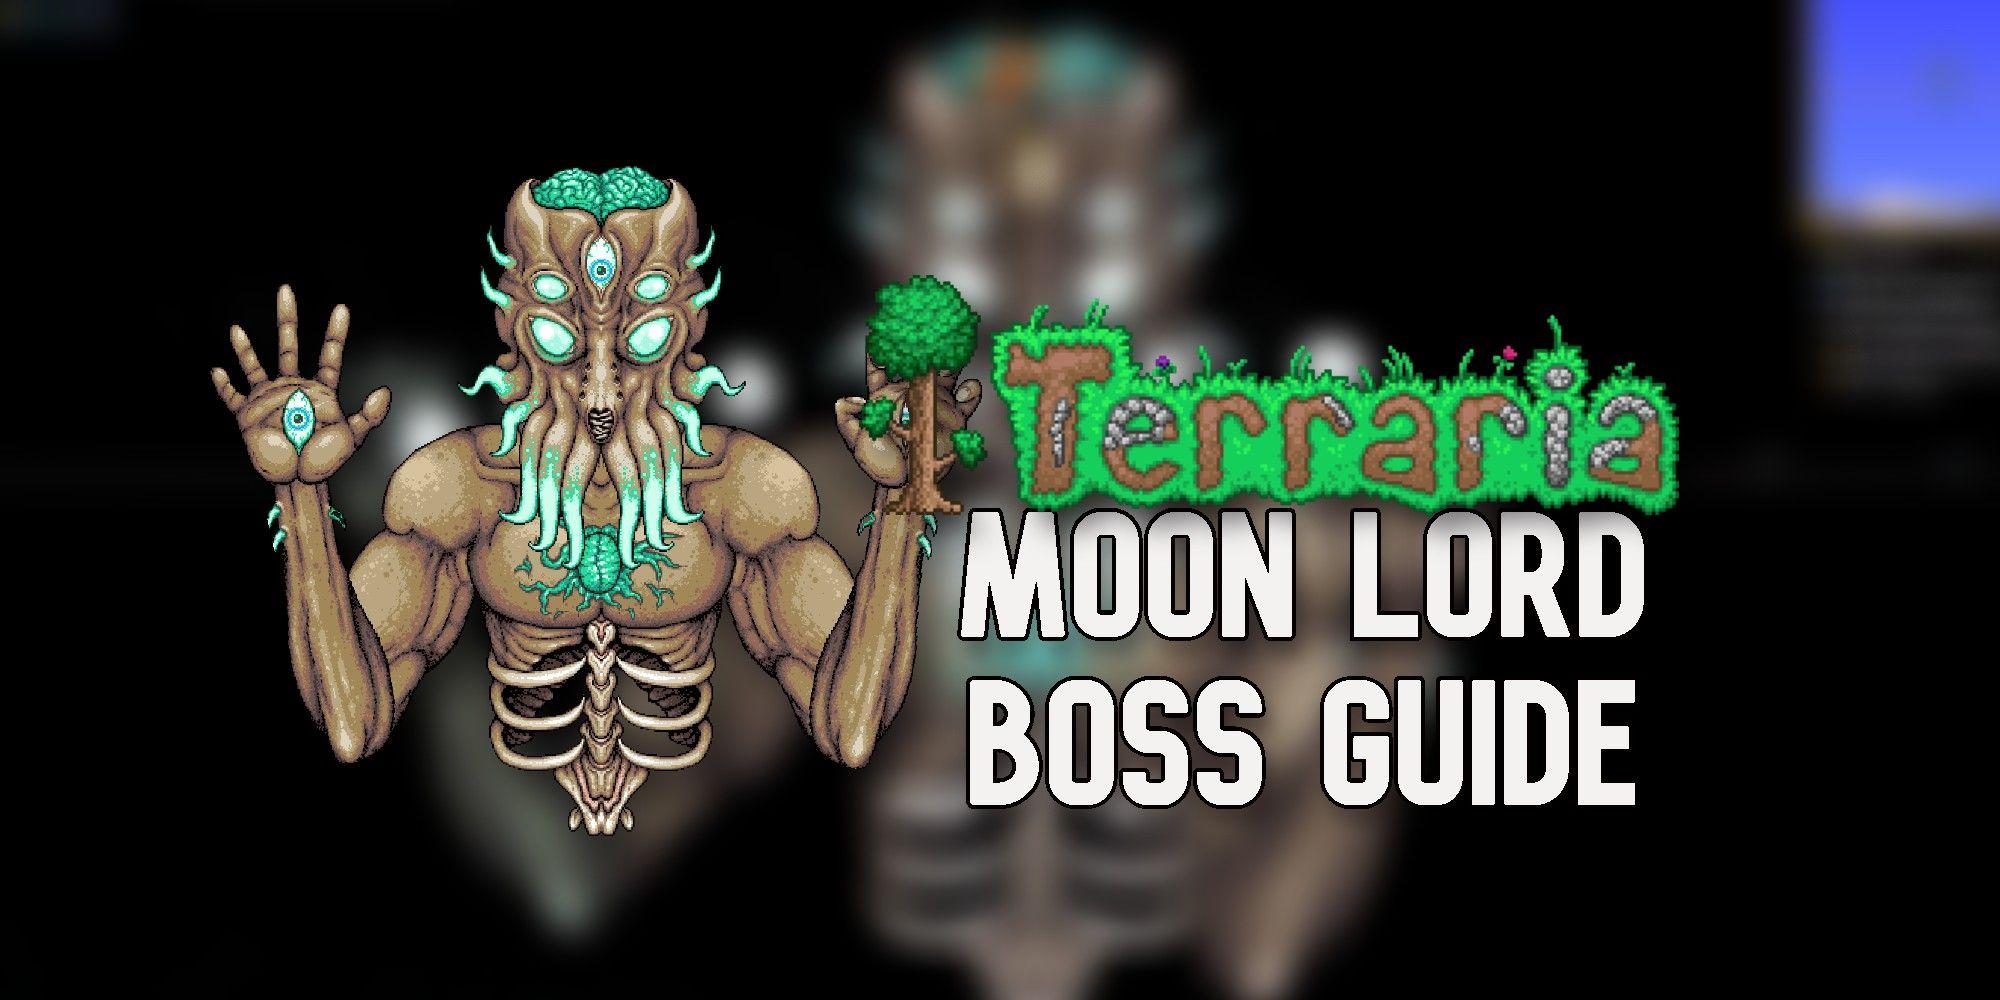 Terraria: Moon Lord Boss Guide